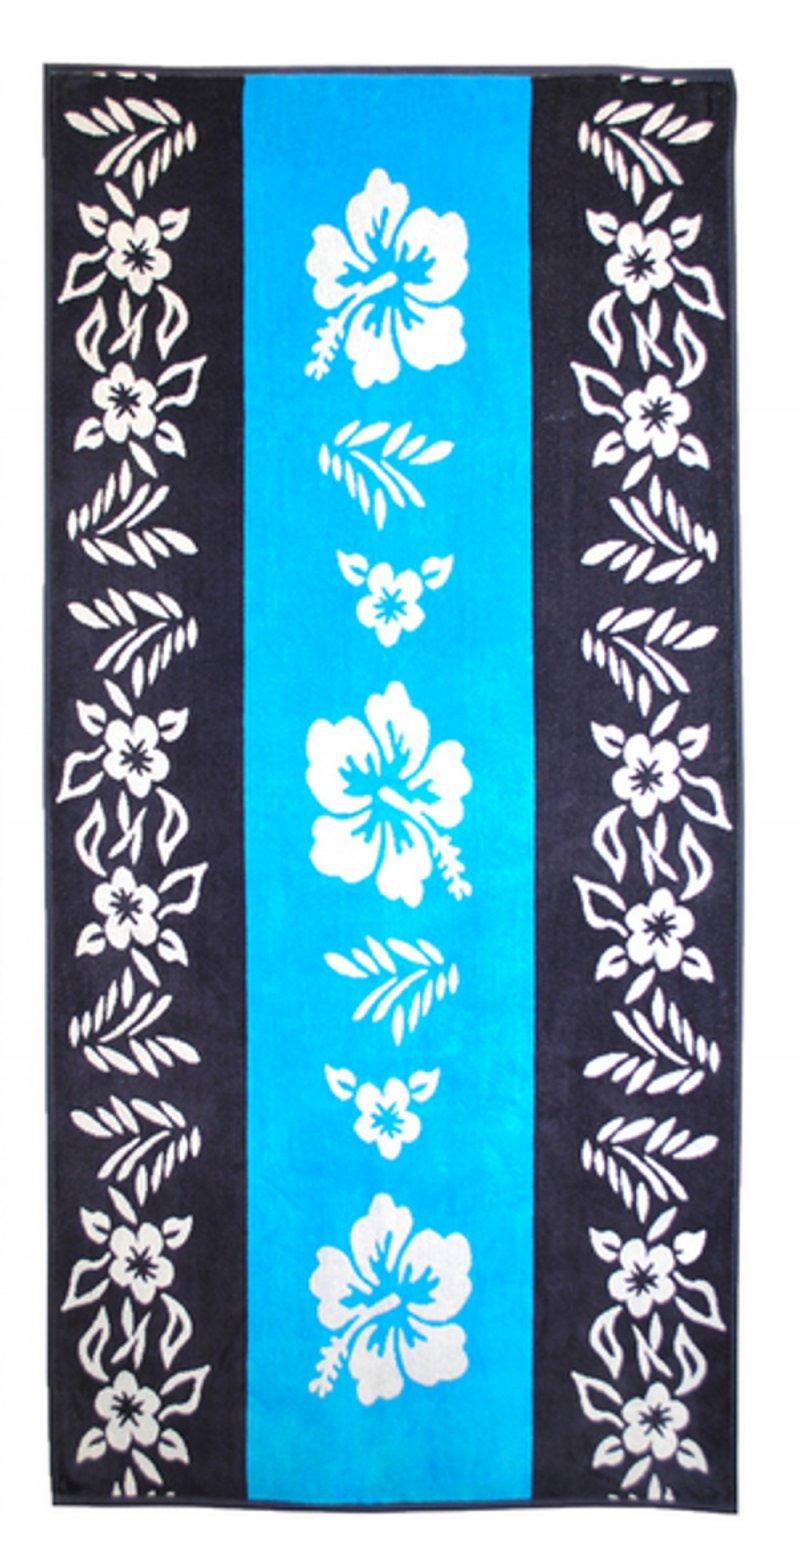 Hibiscus Floral Beach Towel 34